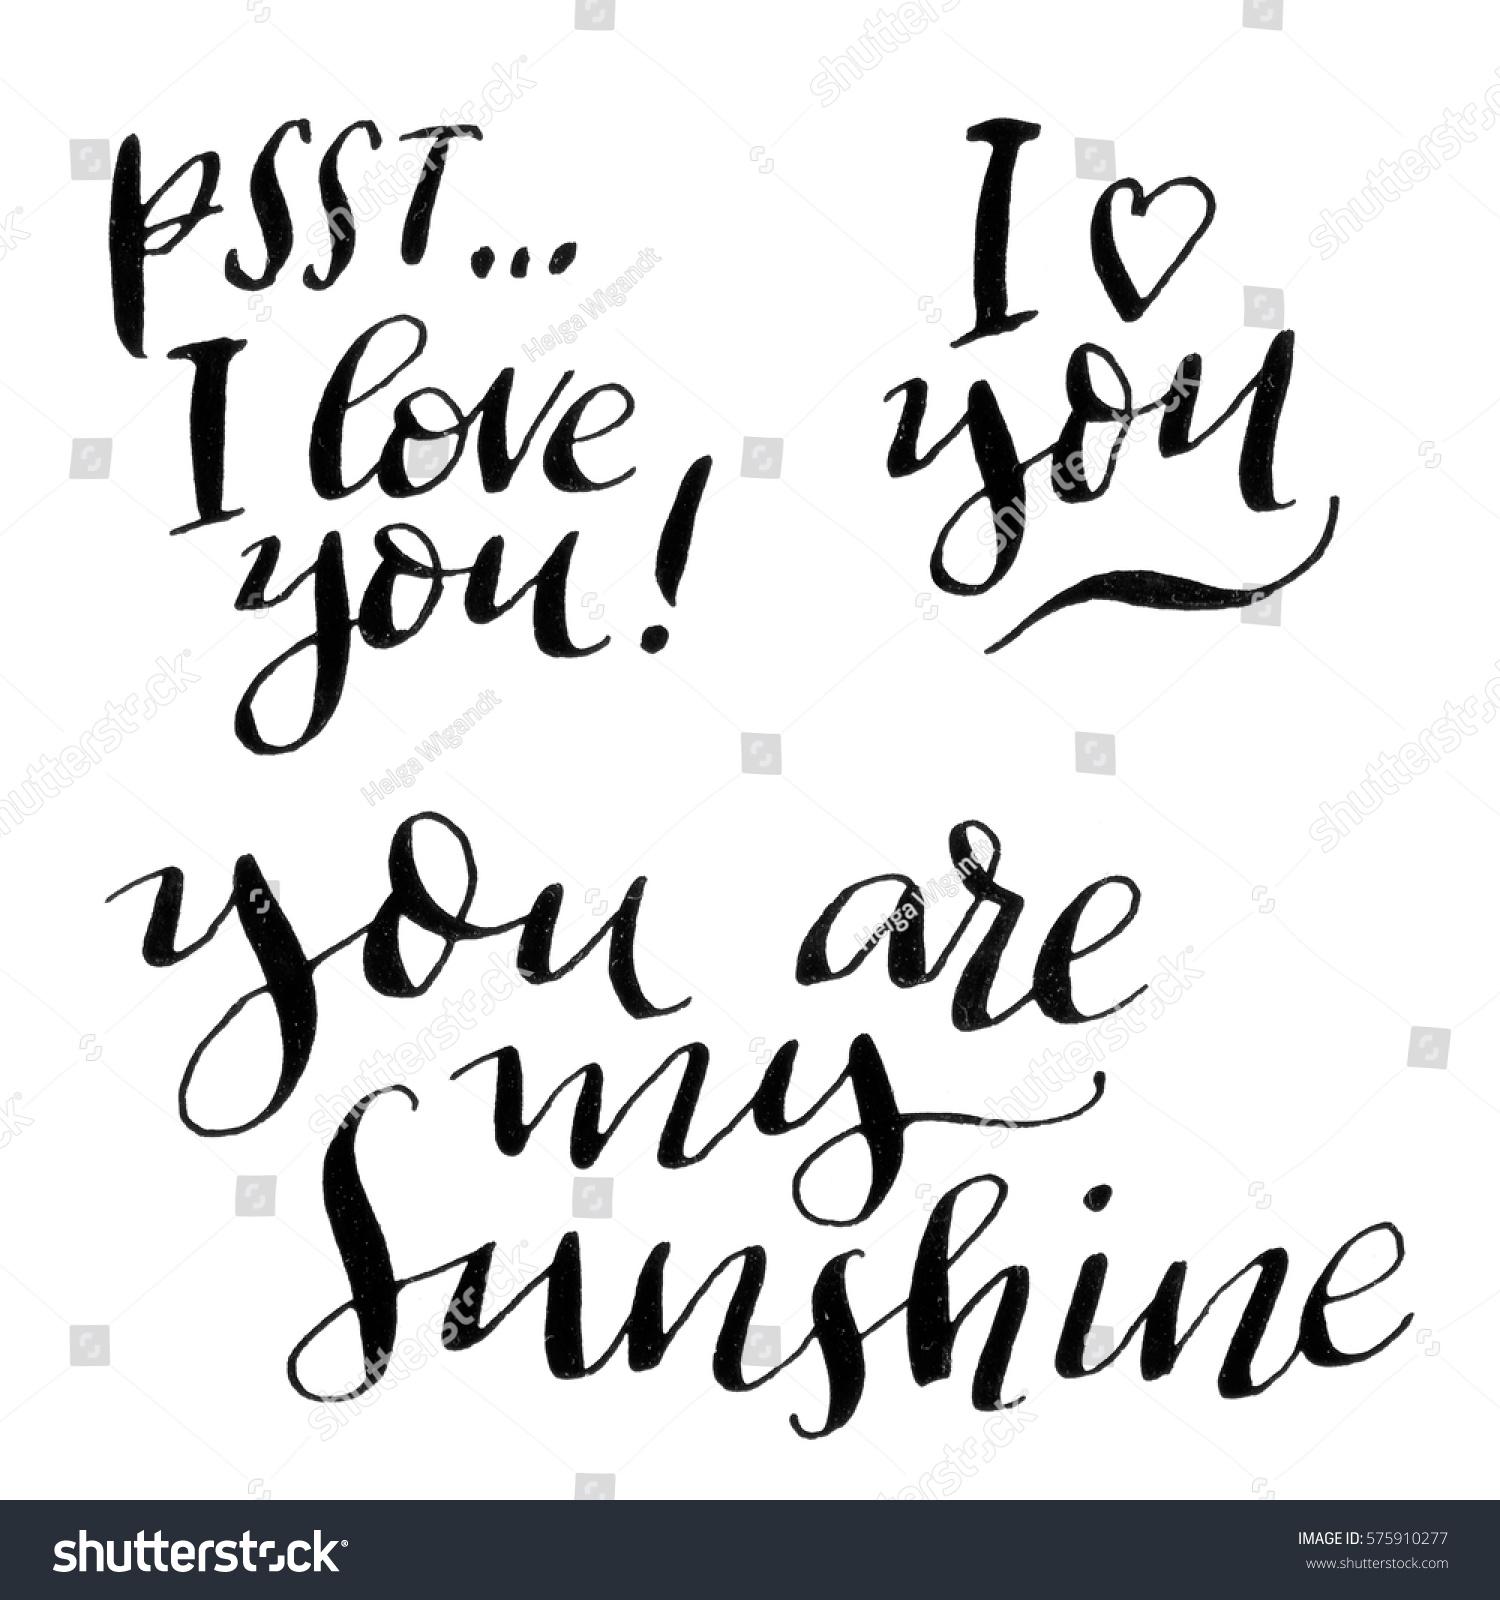 You my sunshine psst love stock illustration